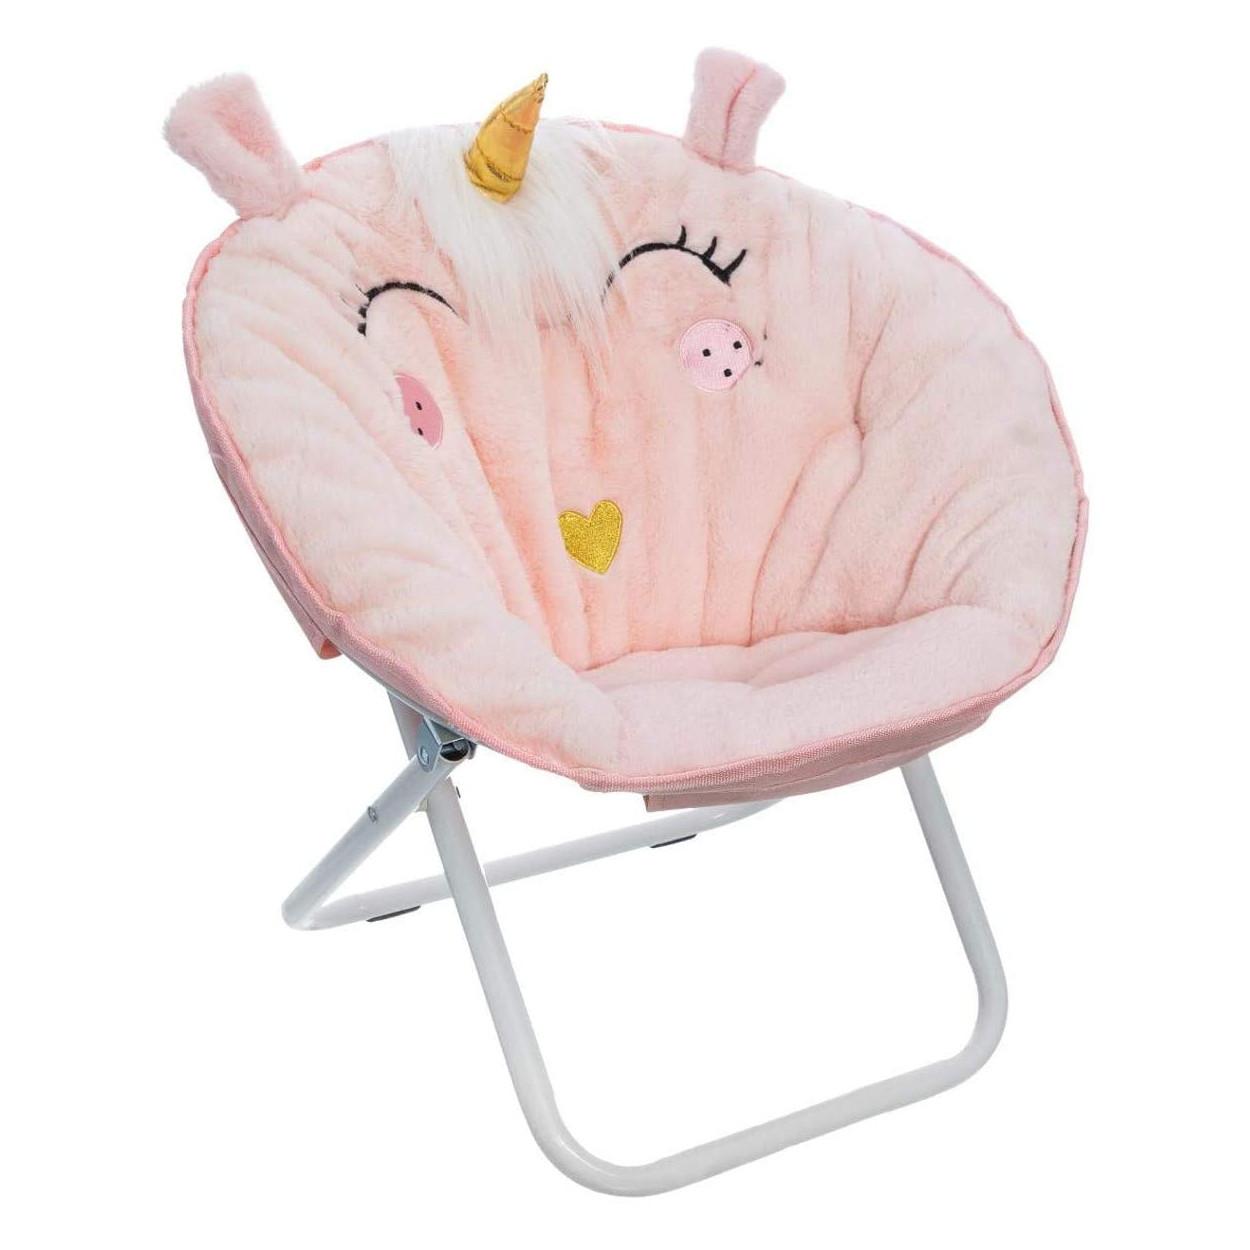 Folding chair Children's Pink Unicorn, Metal Bracket. Children's furniture Kids Decorative 40x50 cm